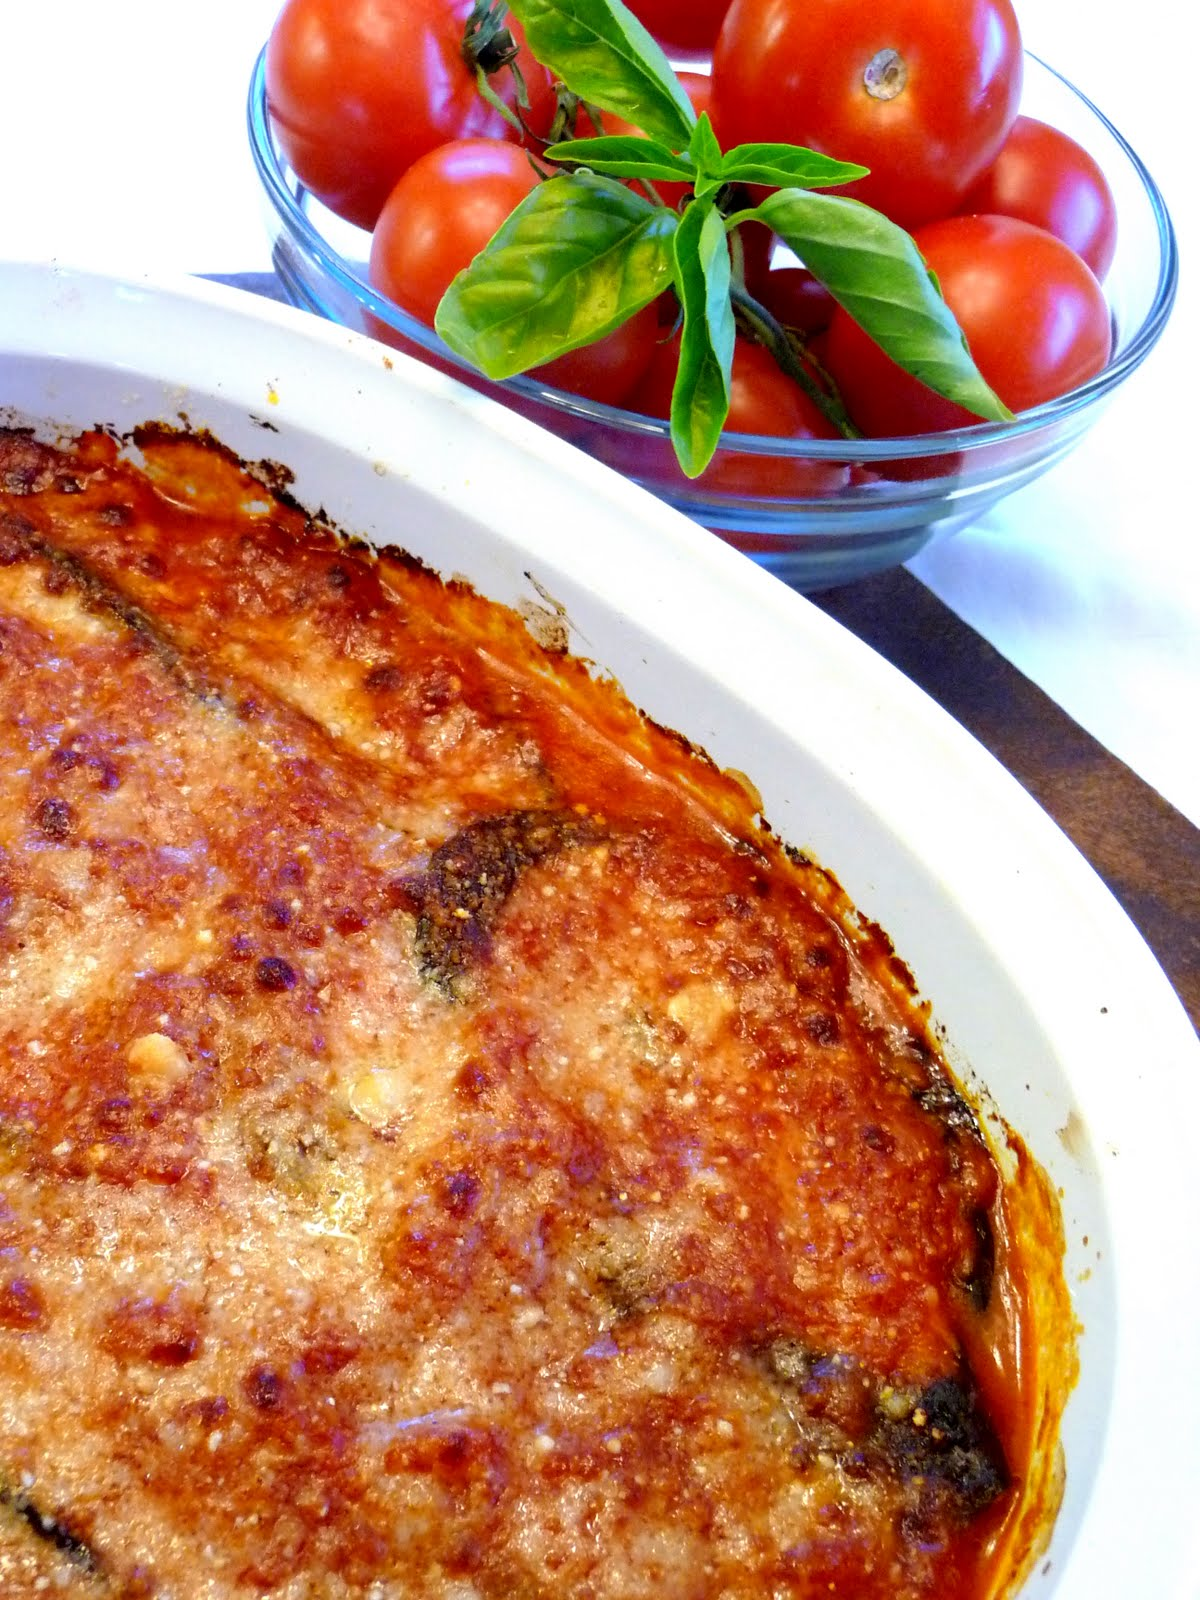 6 Benefits of Homemade Meals + 7 Recipes | The Whole U